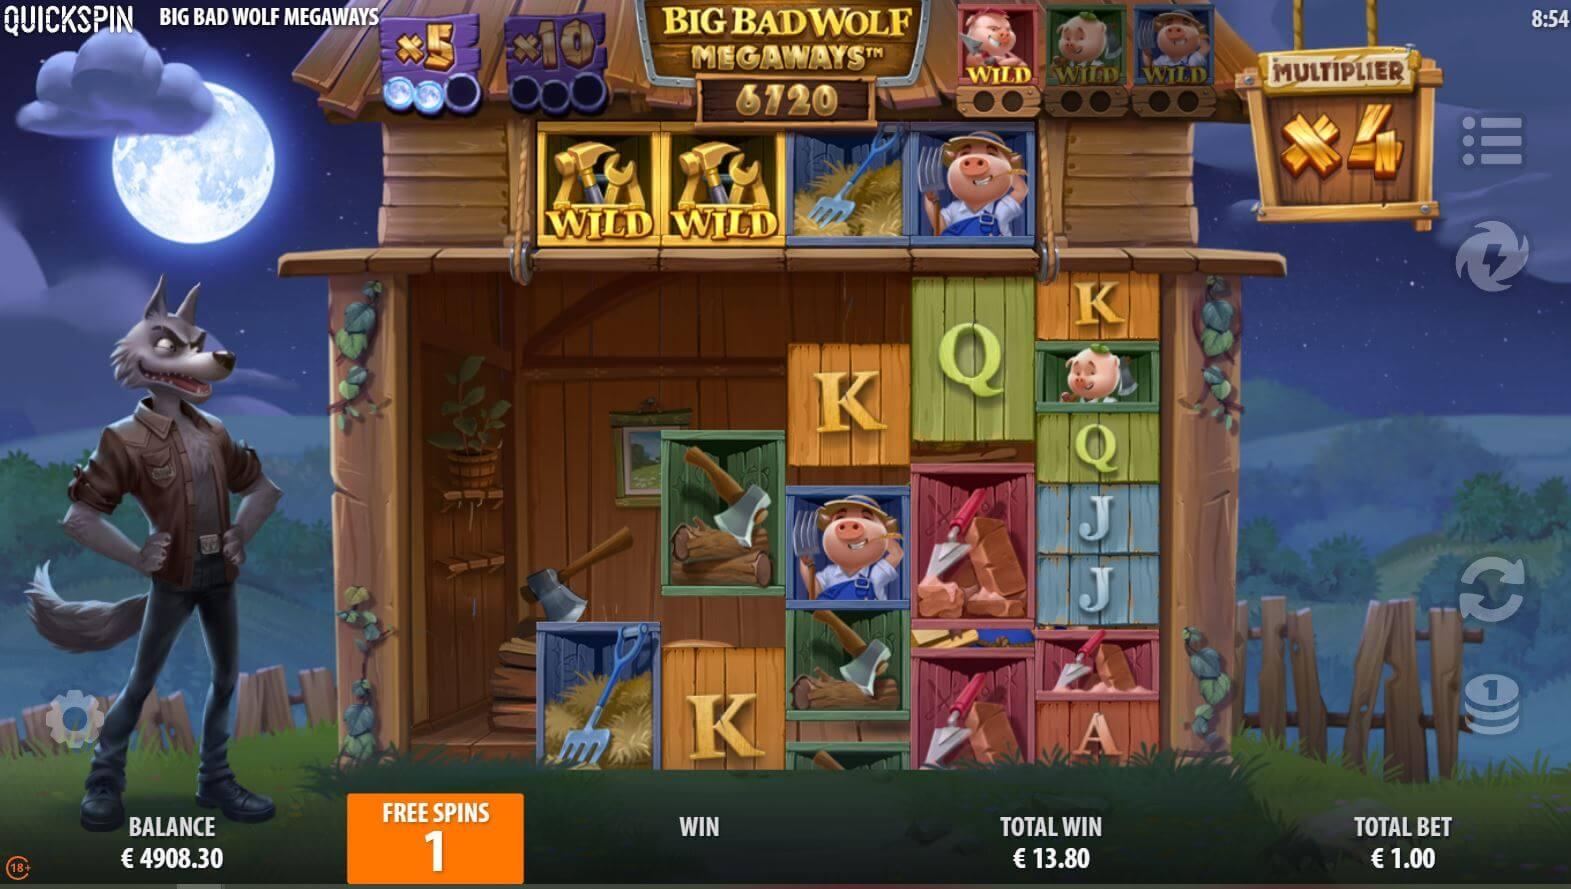 Big Bad Wolf Megaways Bonusgame